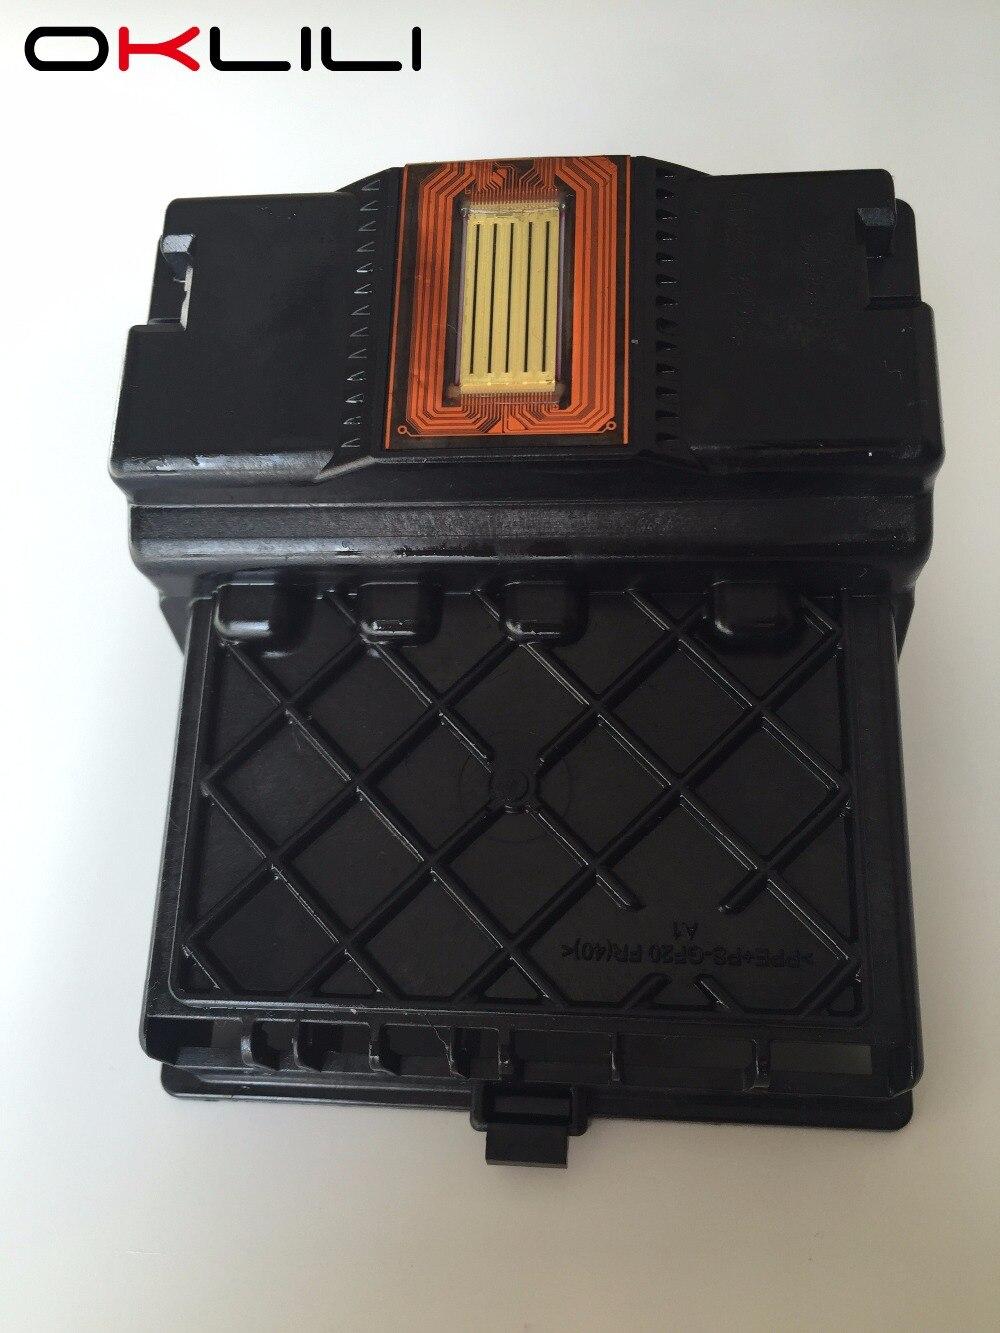 14N1339 Printhead for Lexmark 100 Pro205 Pro208 Pro209 Pro705 Pro708 Pro715